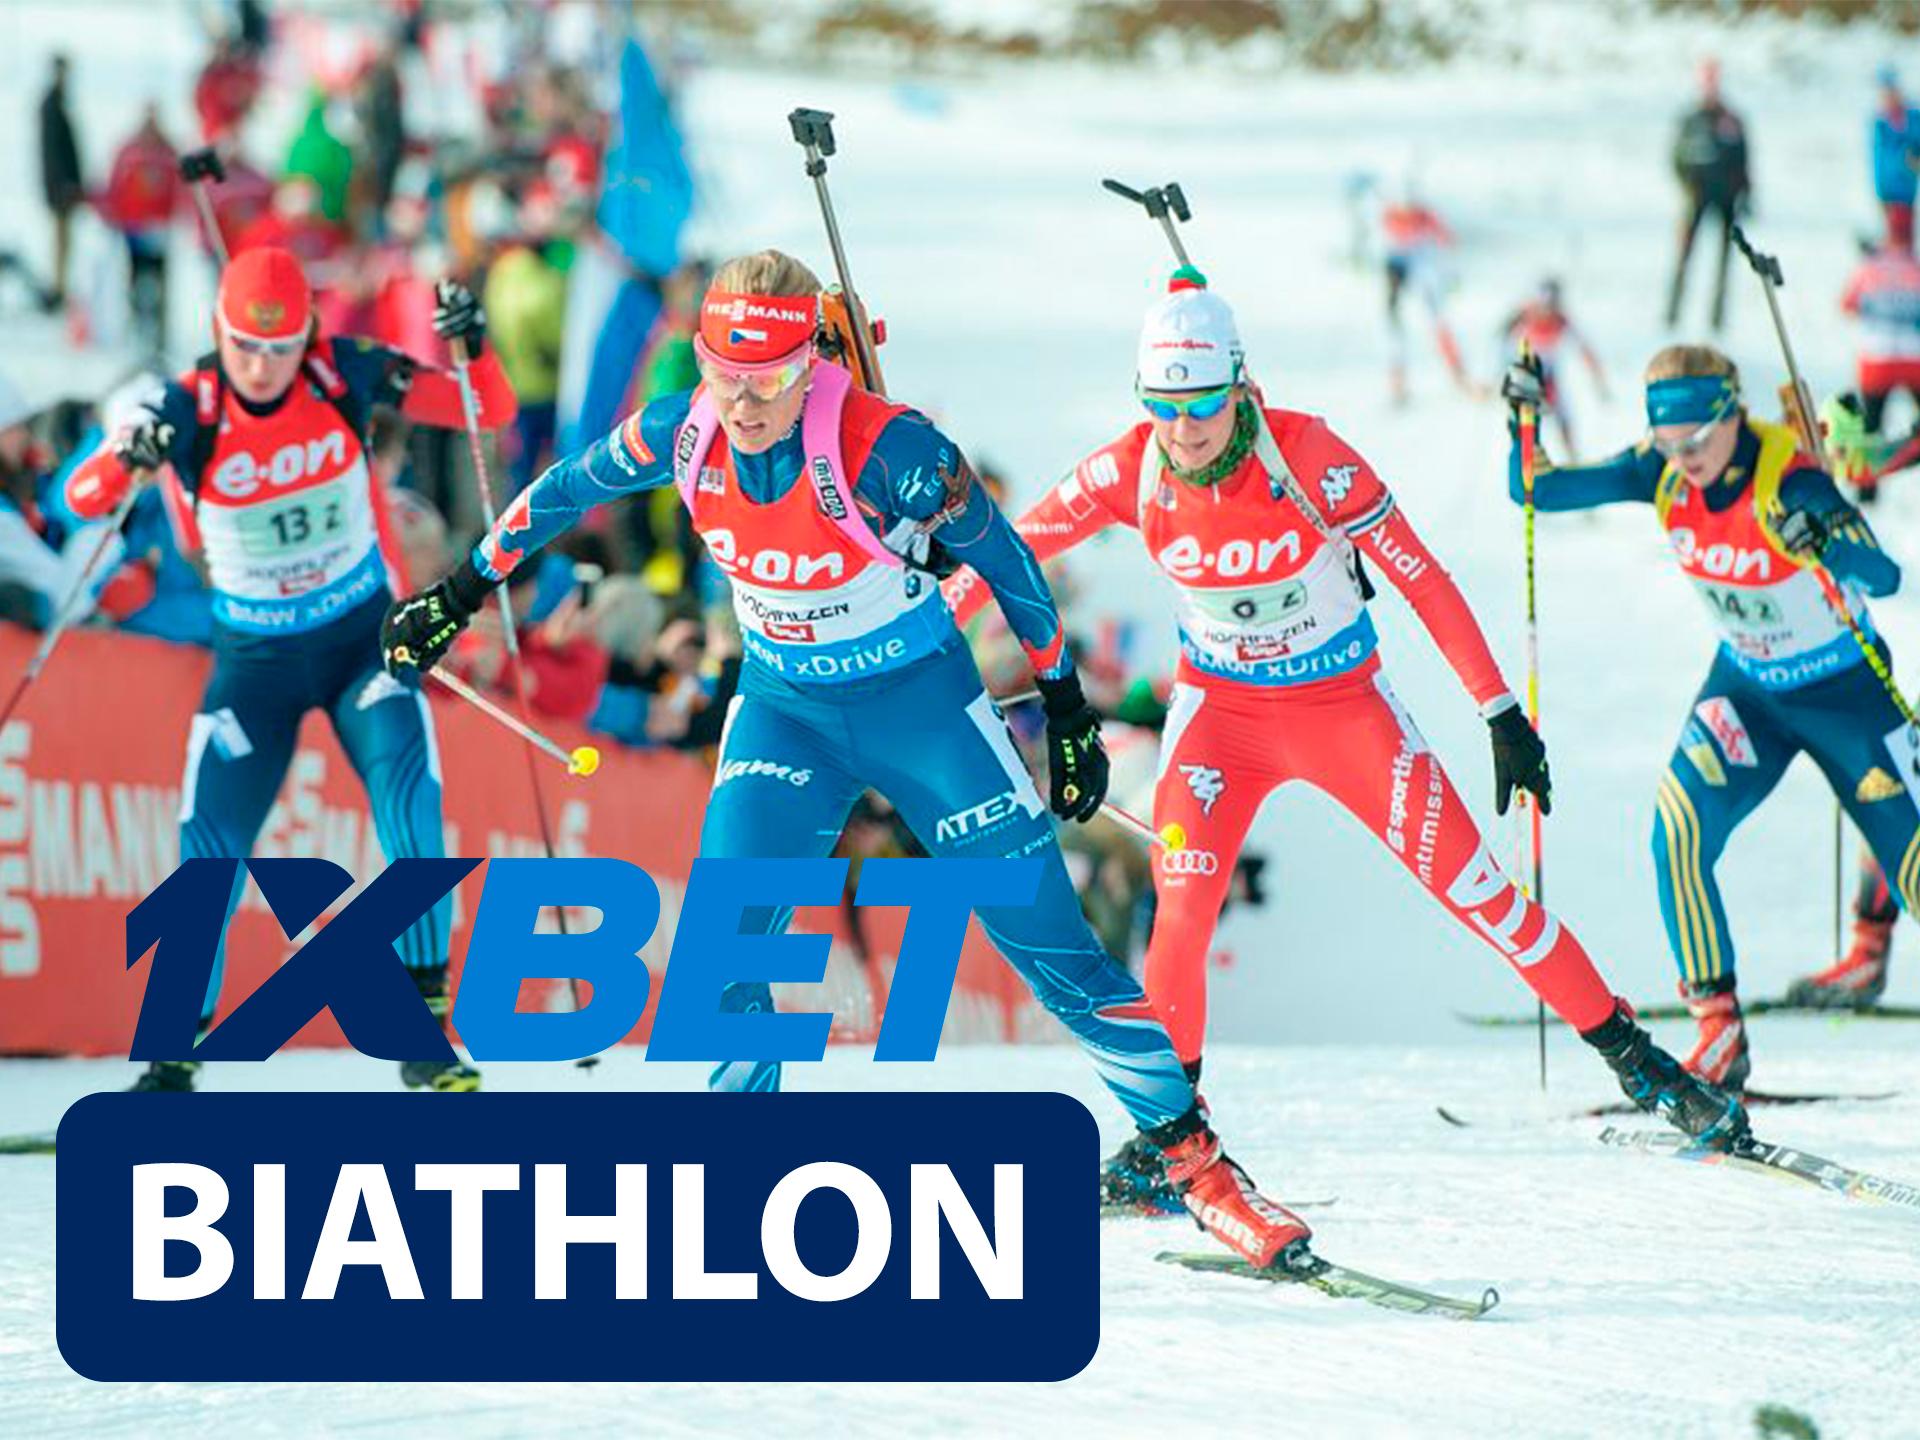 Start betting on biathlon with 1xBet.